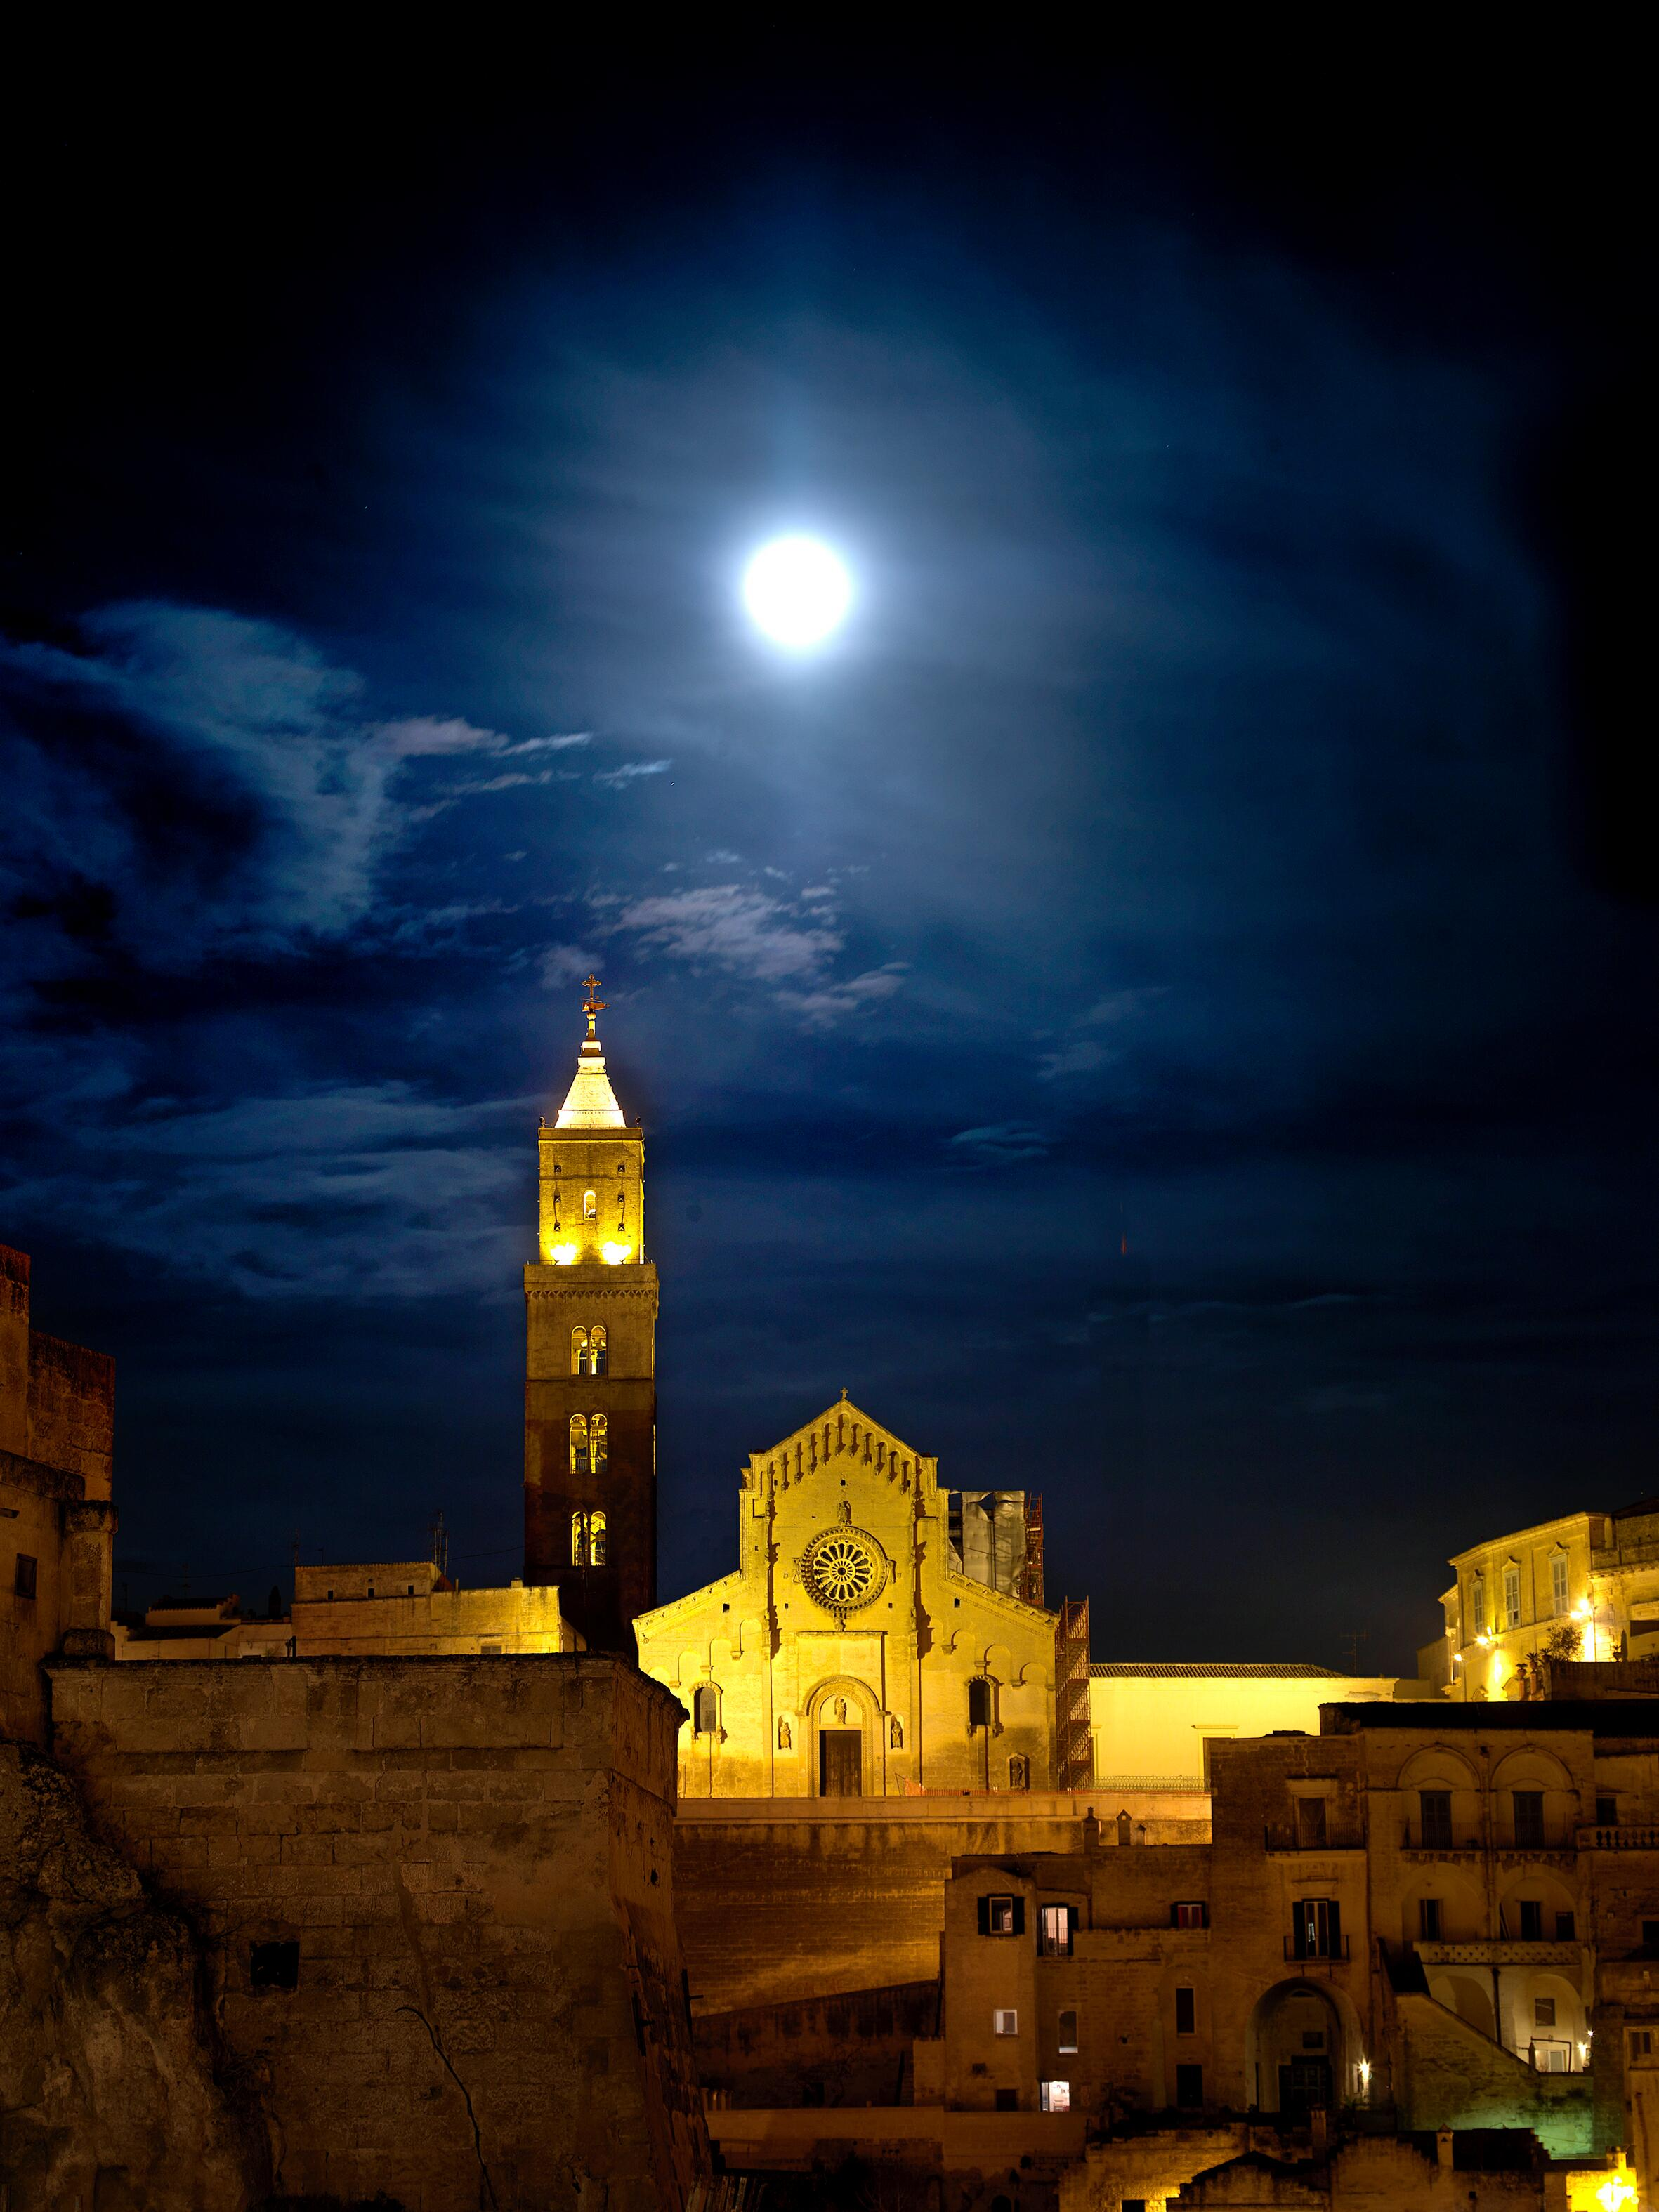 Full moon over the basilica, Matera - 2019 City of Culture